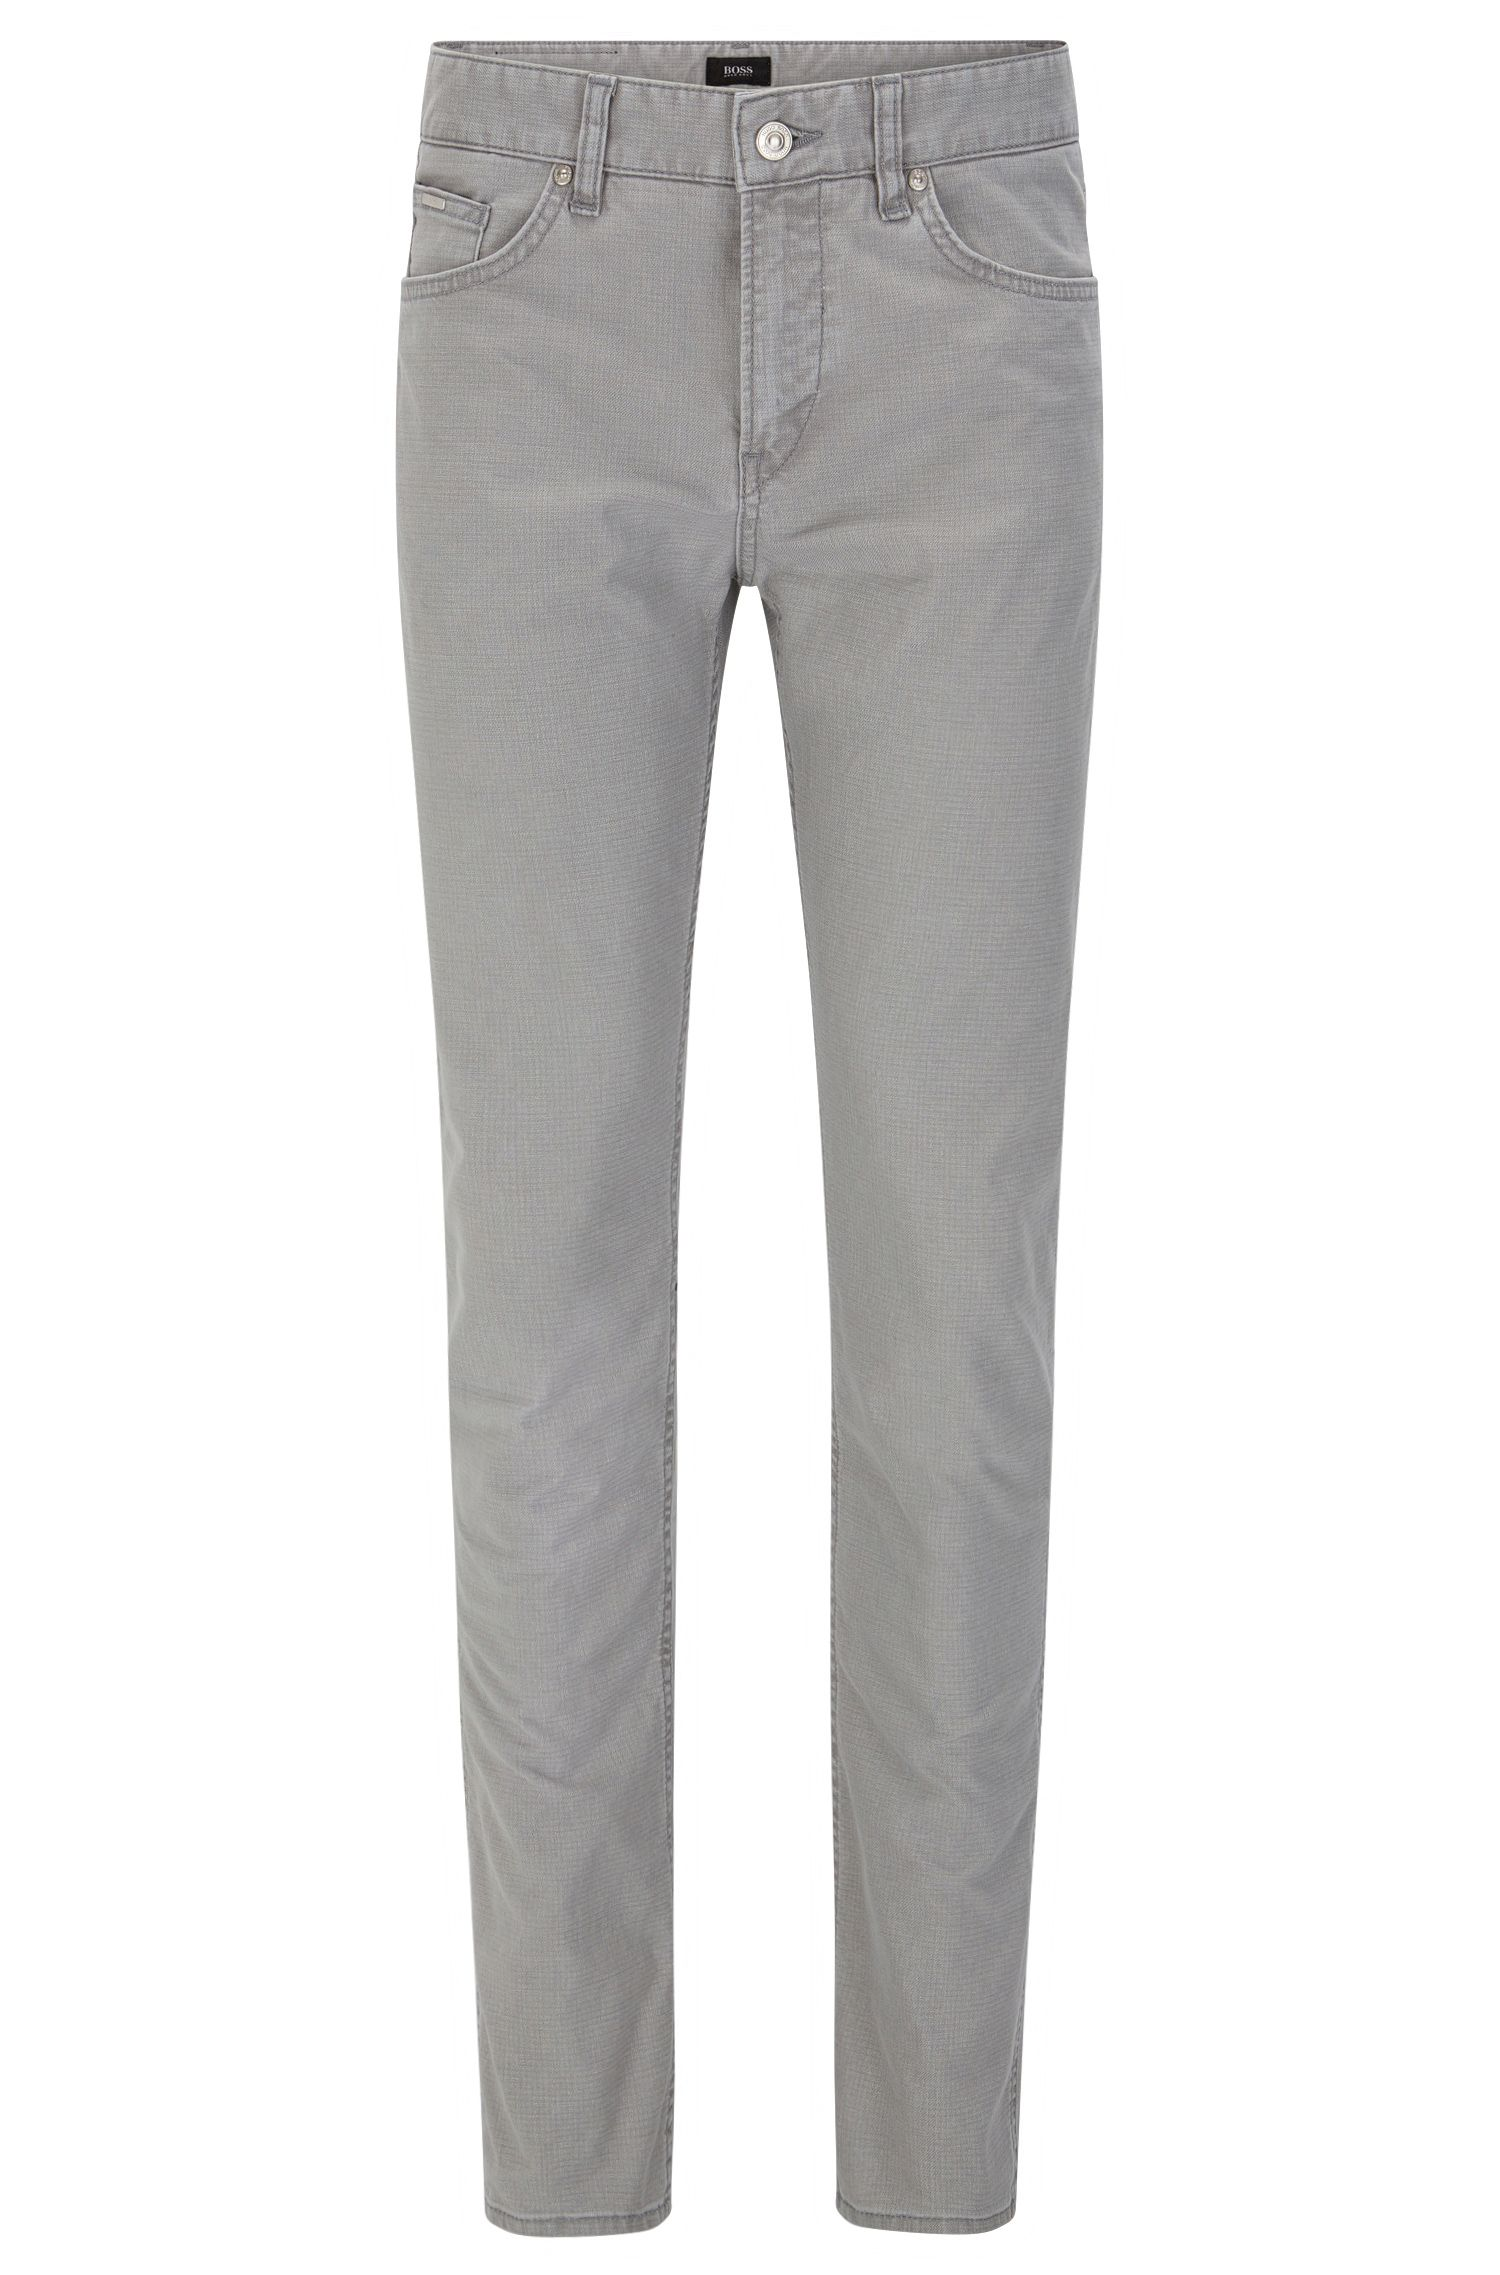 10 oz Patterned Stretch Cotton Pants, Slim Fit   Delaware